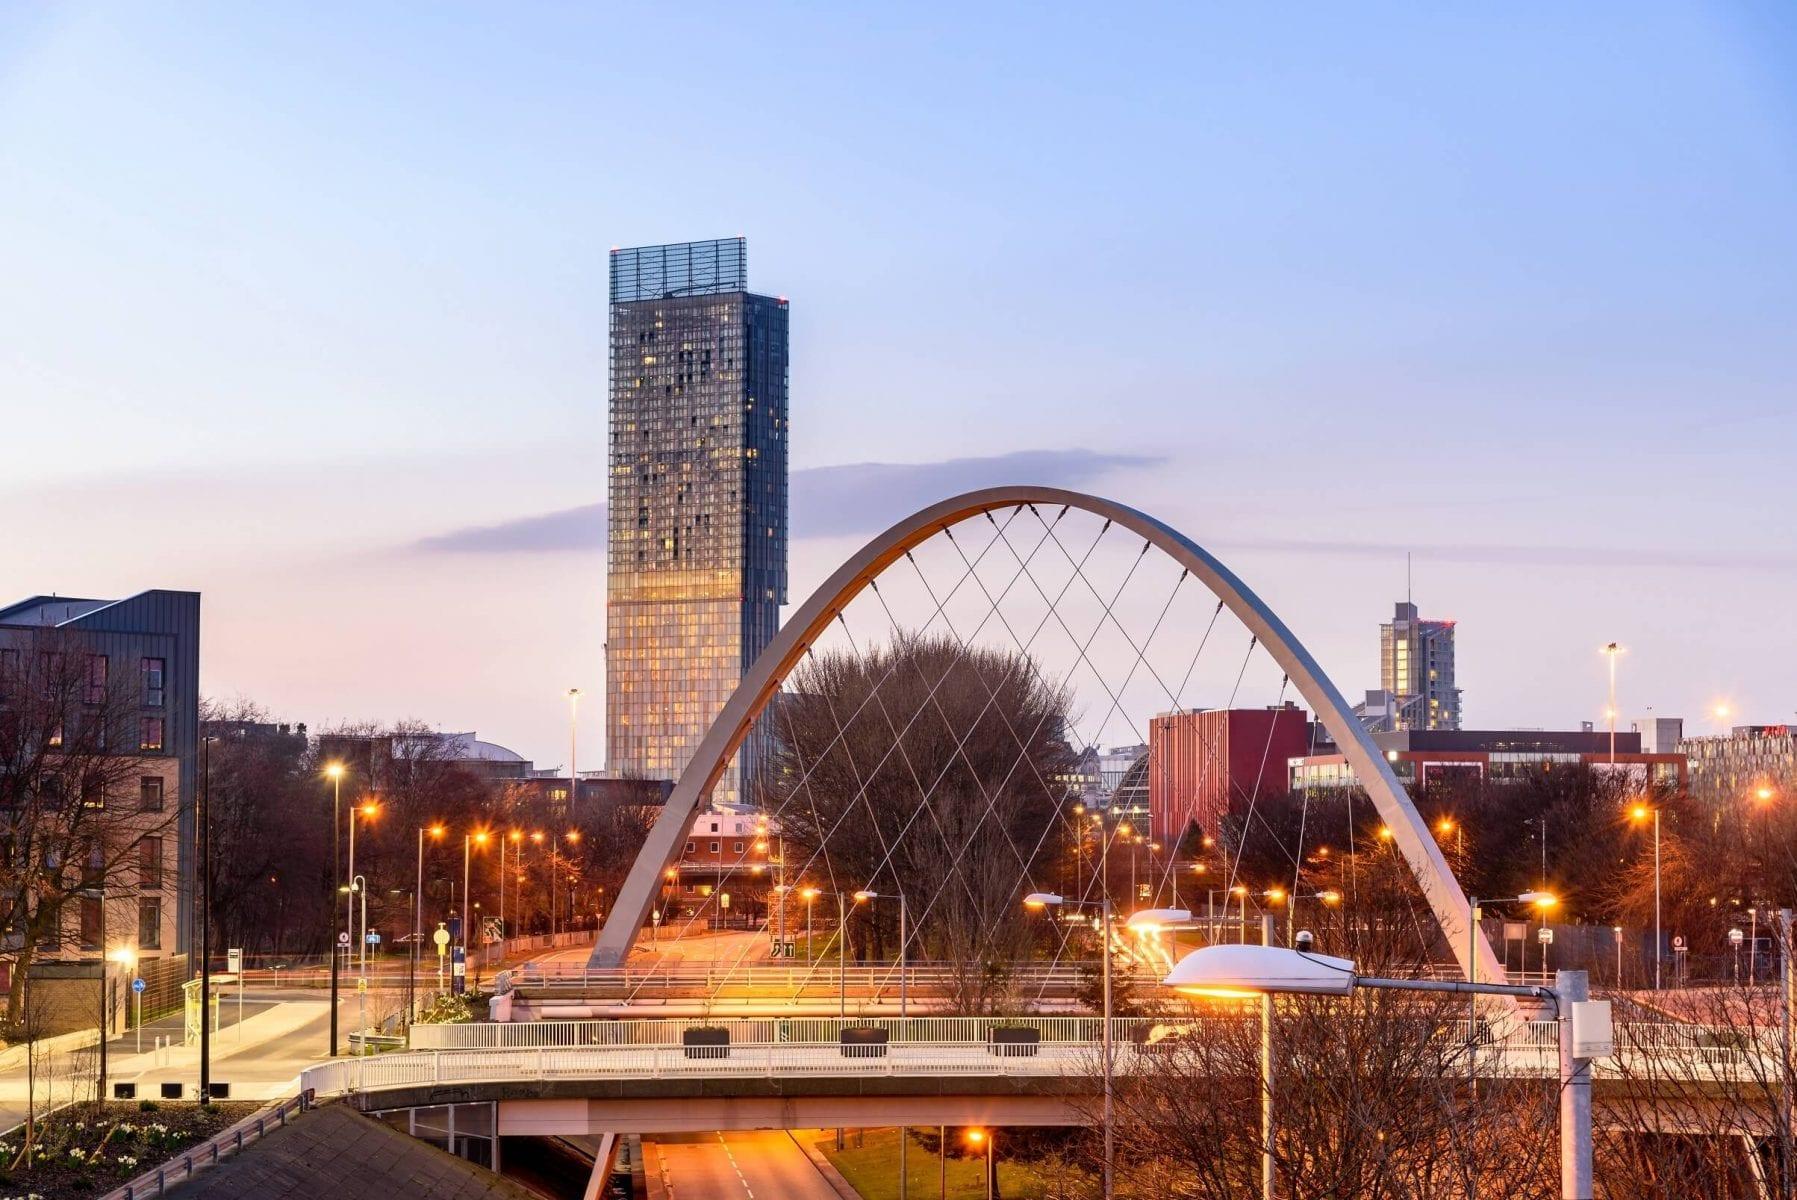 Manchester Hulme Bridge